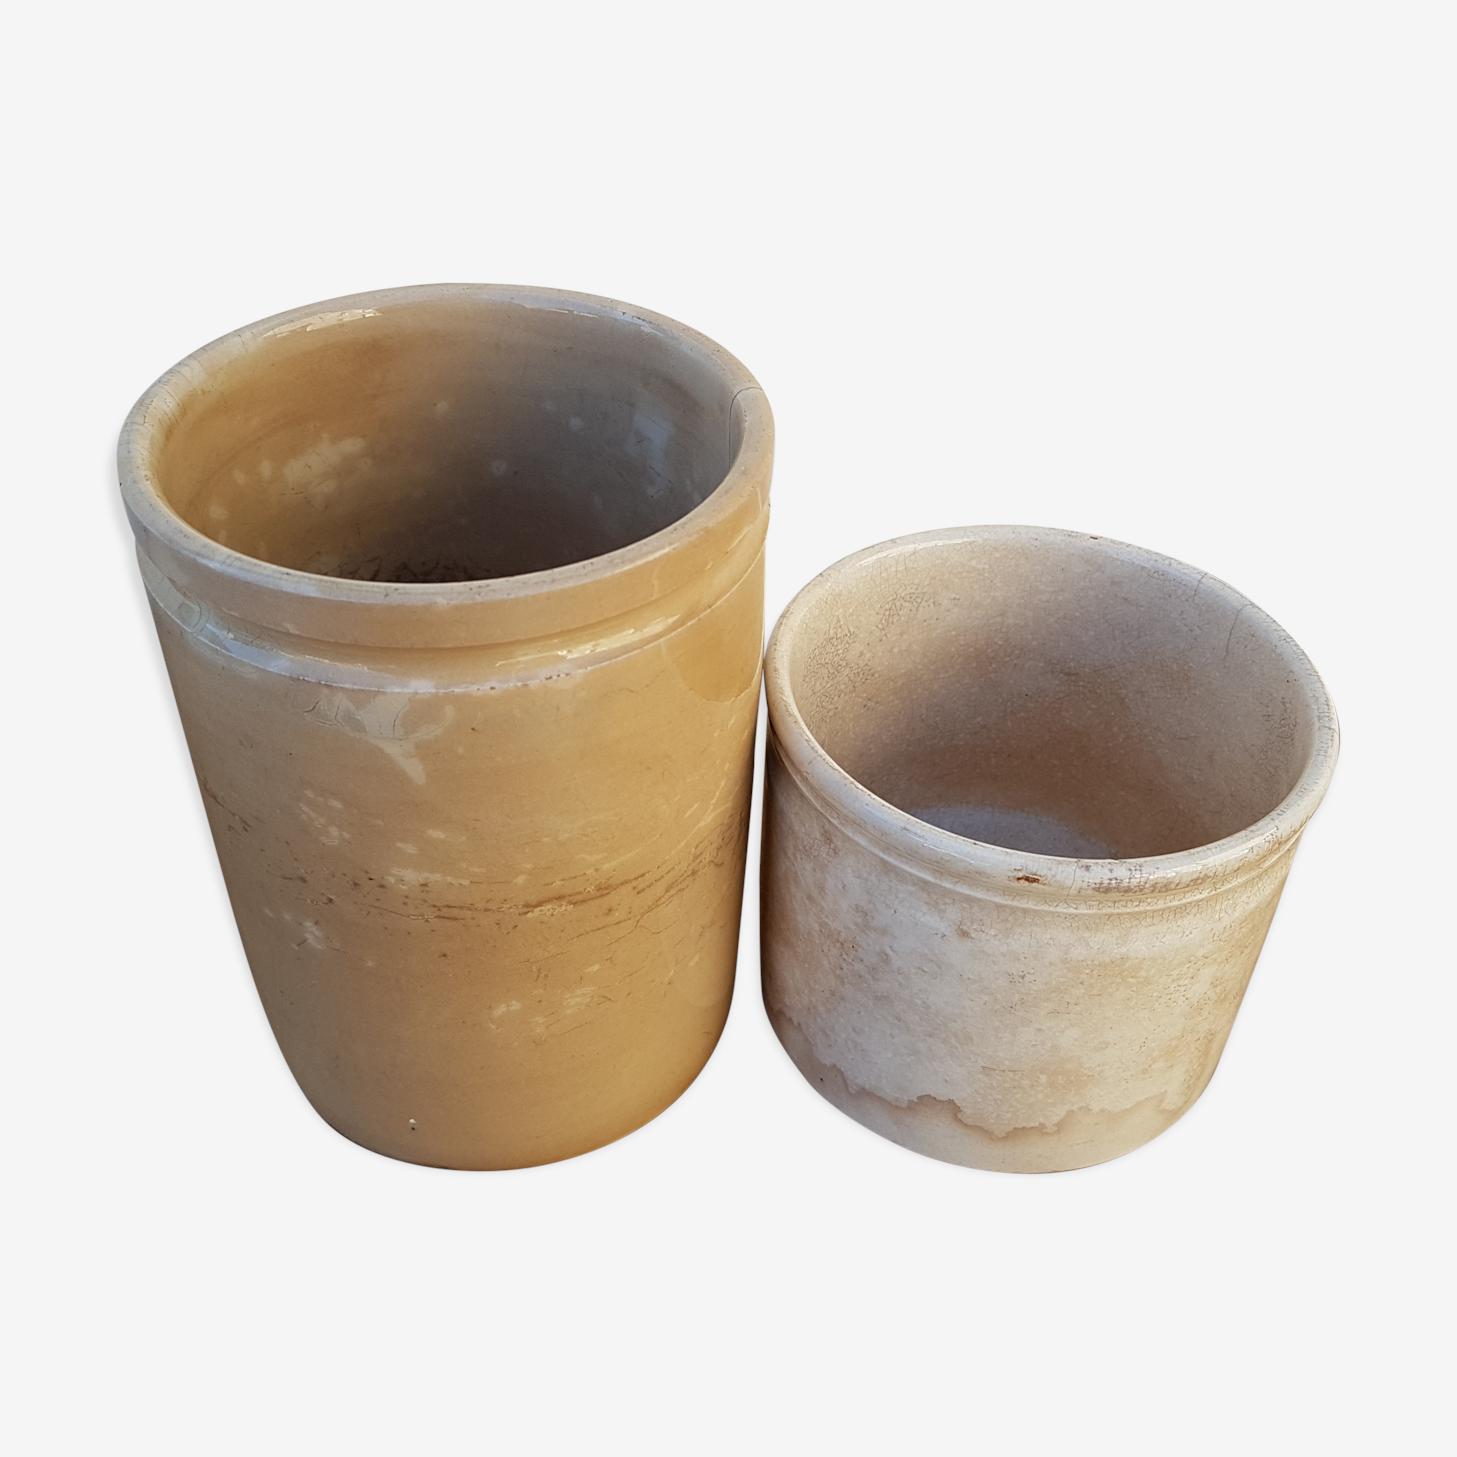 Duo of jam in stoneware jars